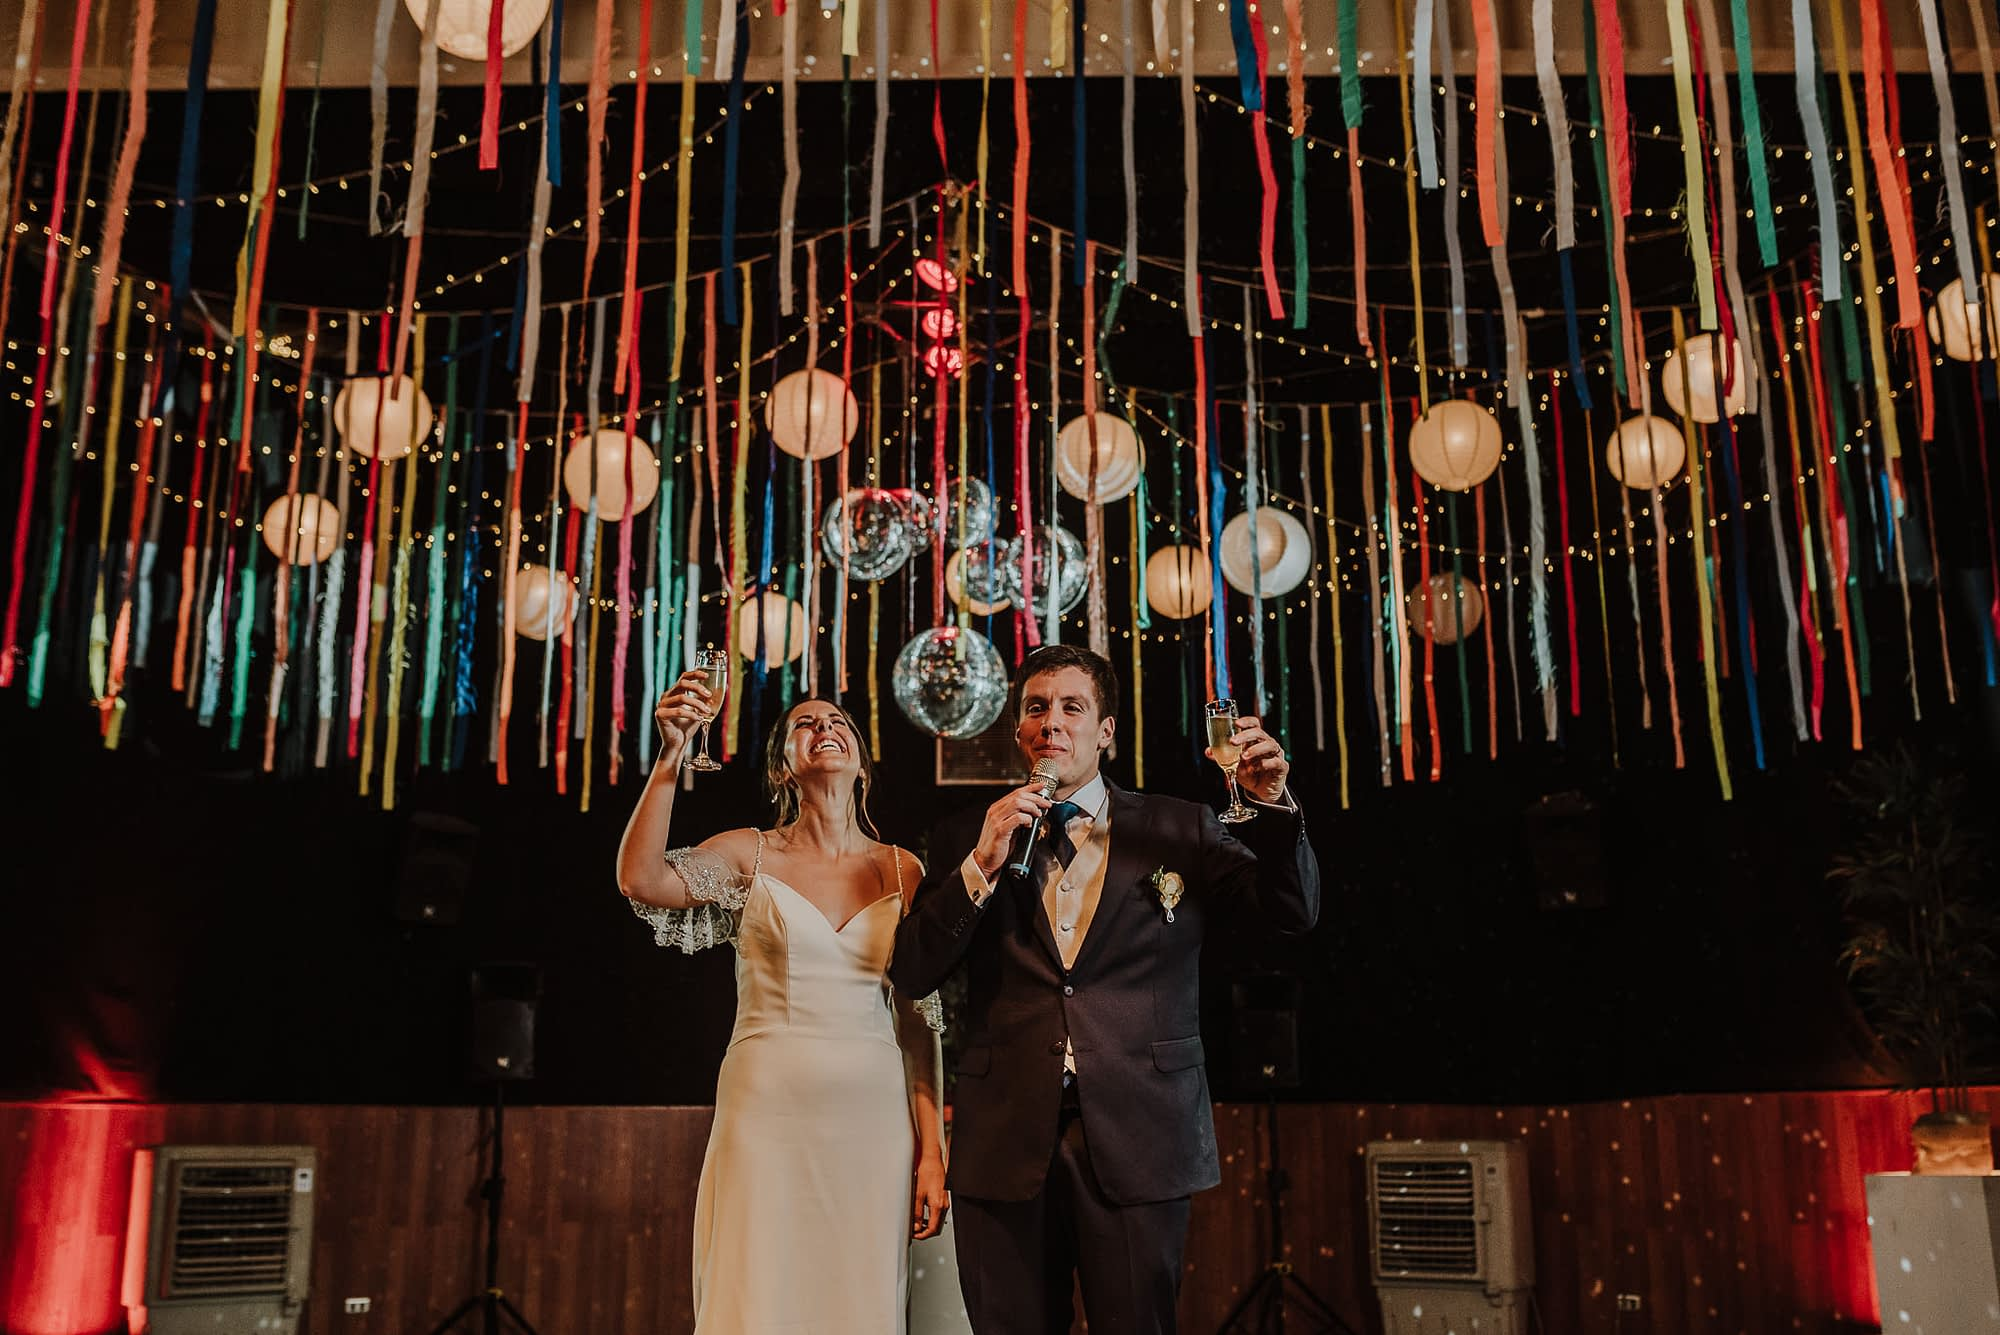 fotografo de matrimonios-los ingleses de chicureo-brindis